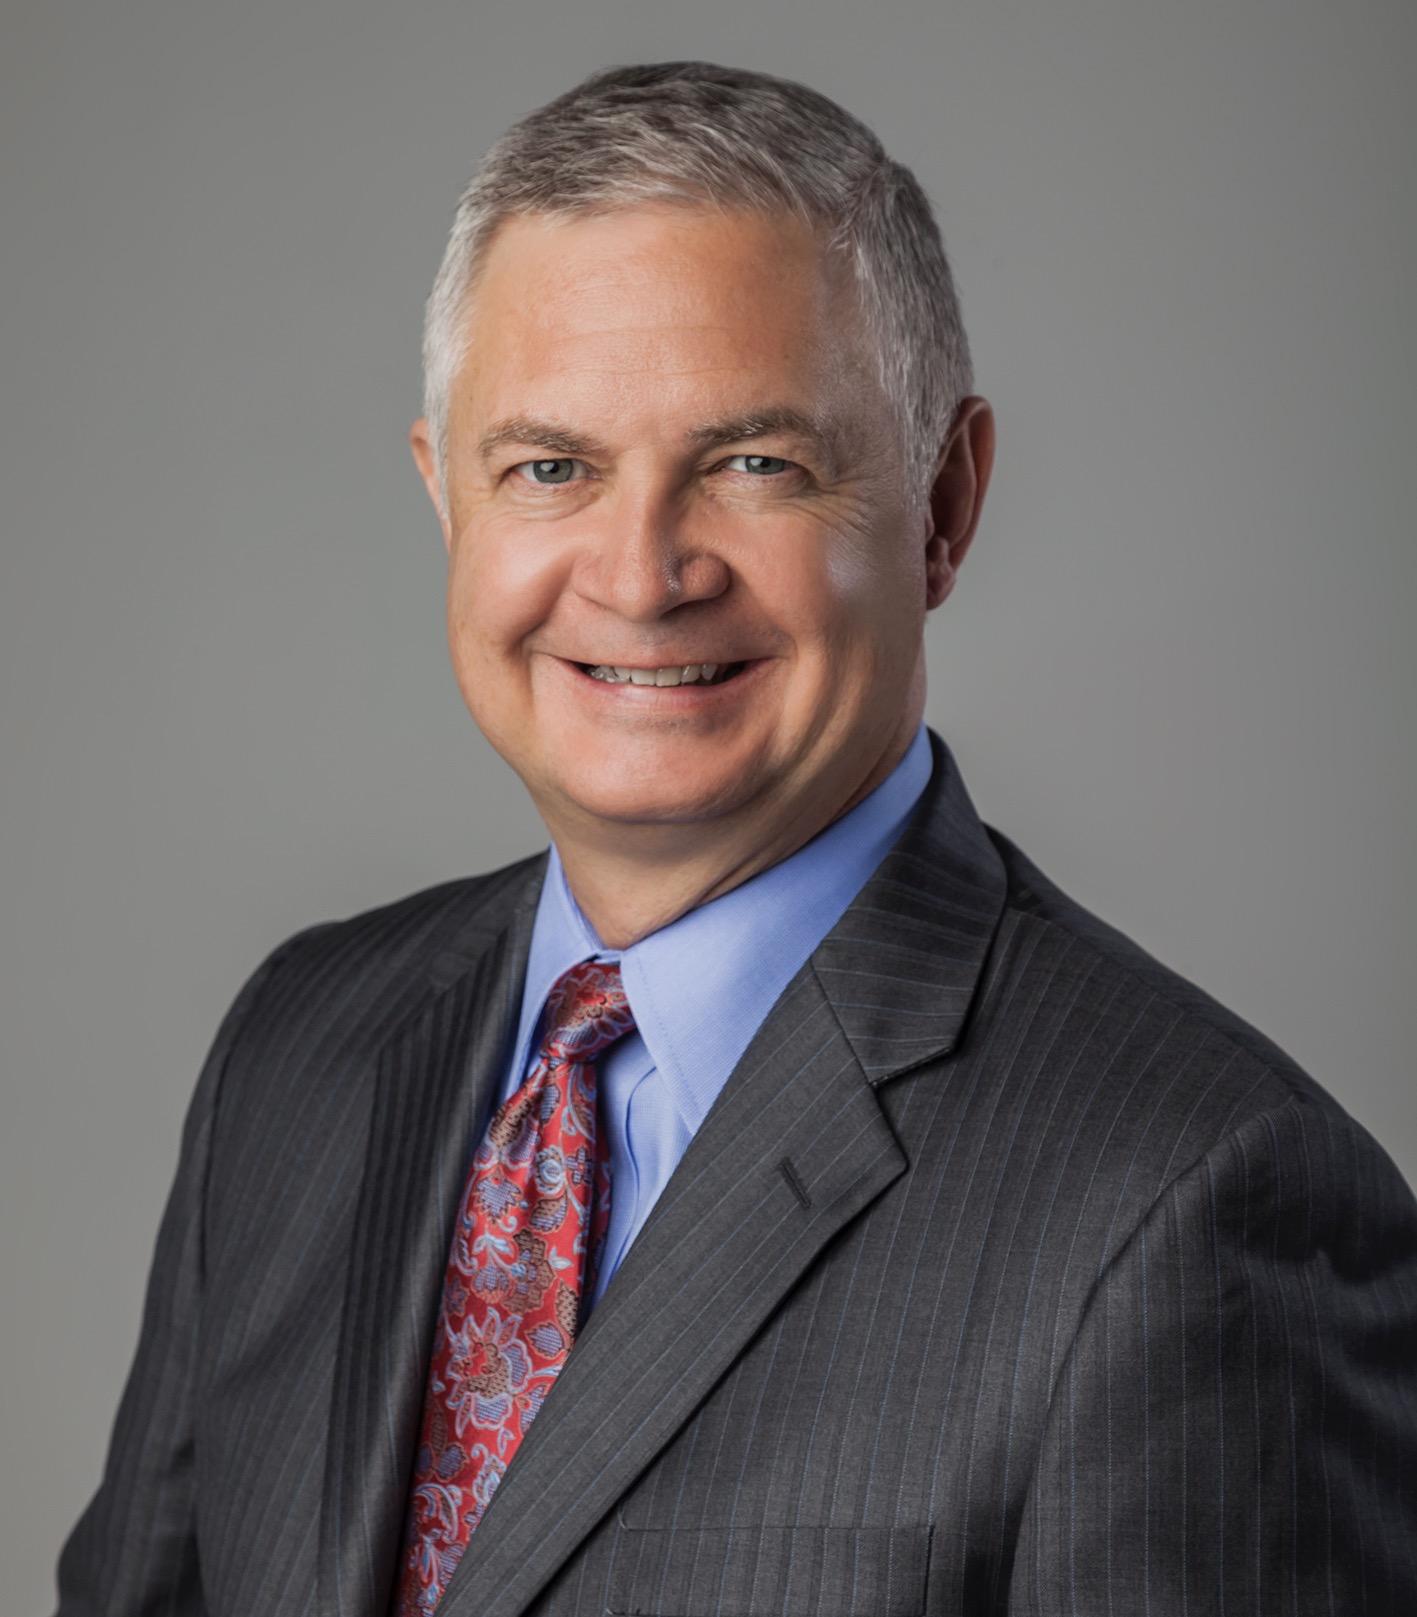 Mark Jones, President, Orlando Regional Medical Center, Orlando Health